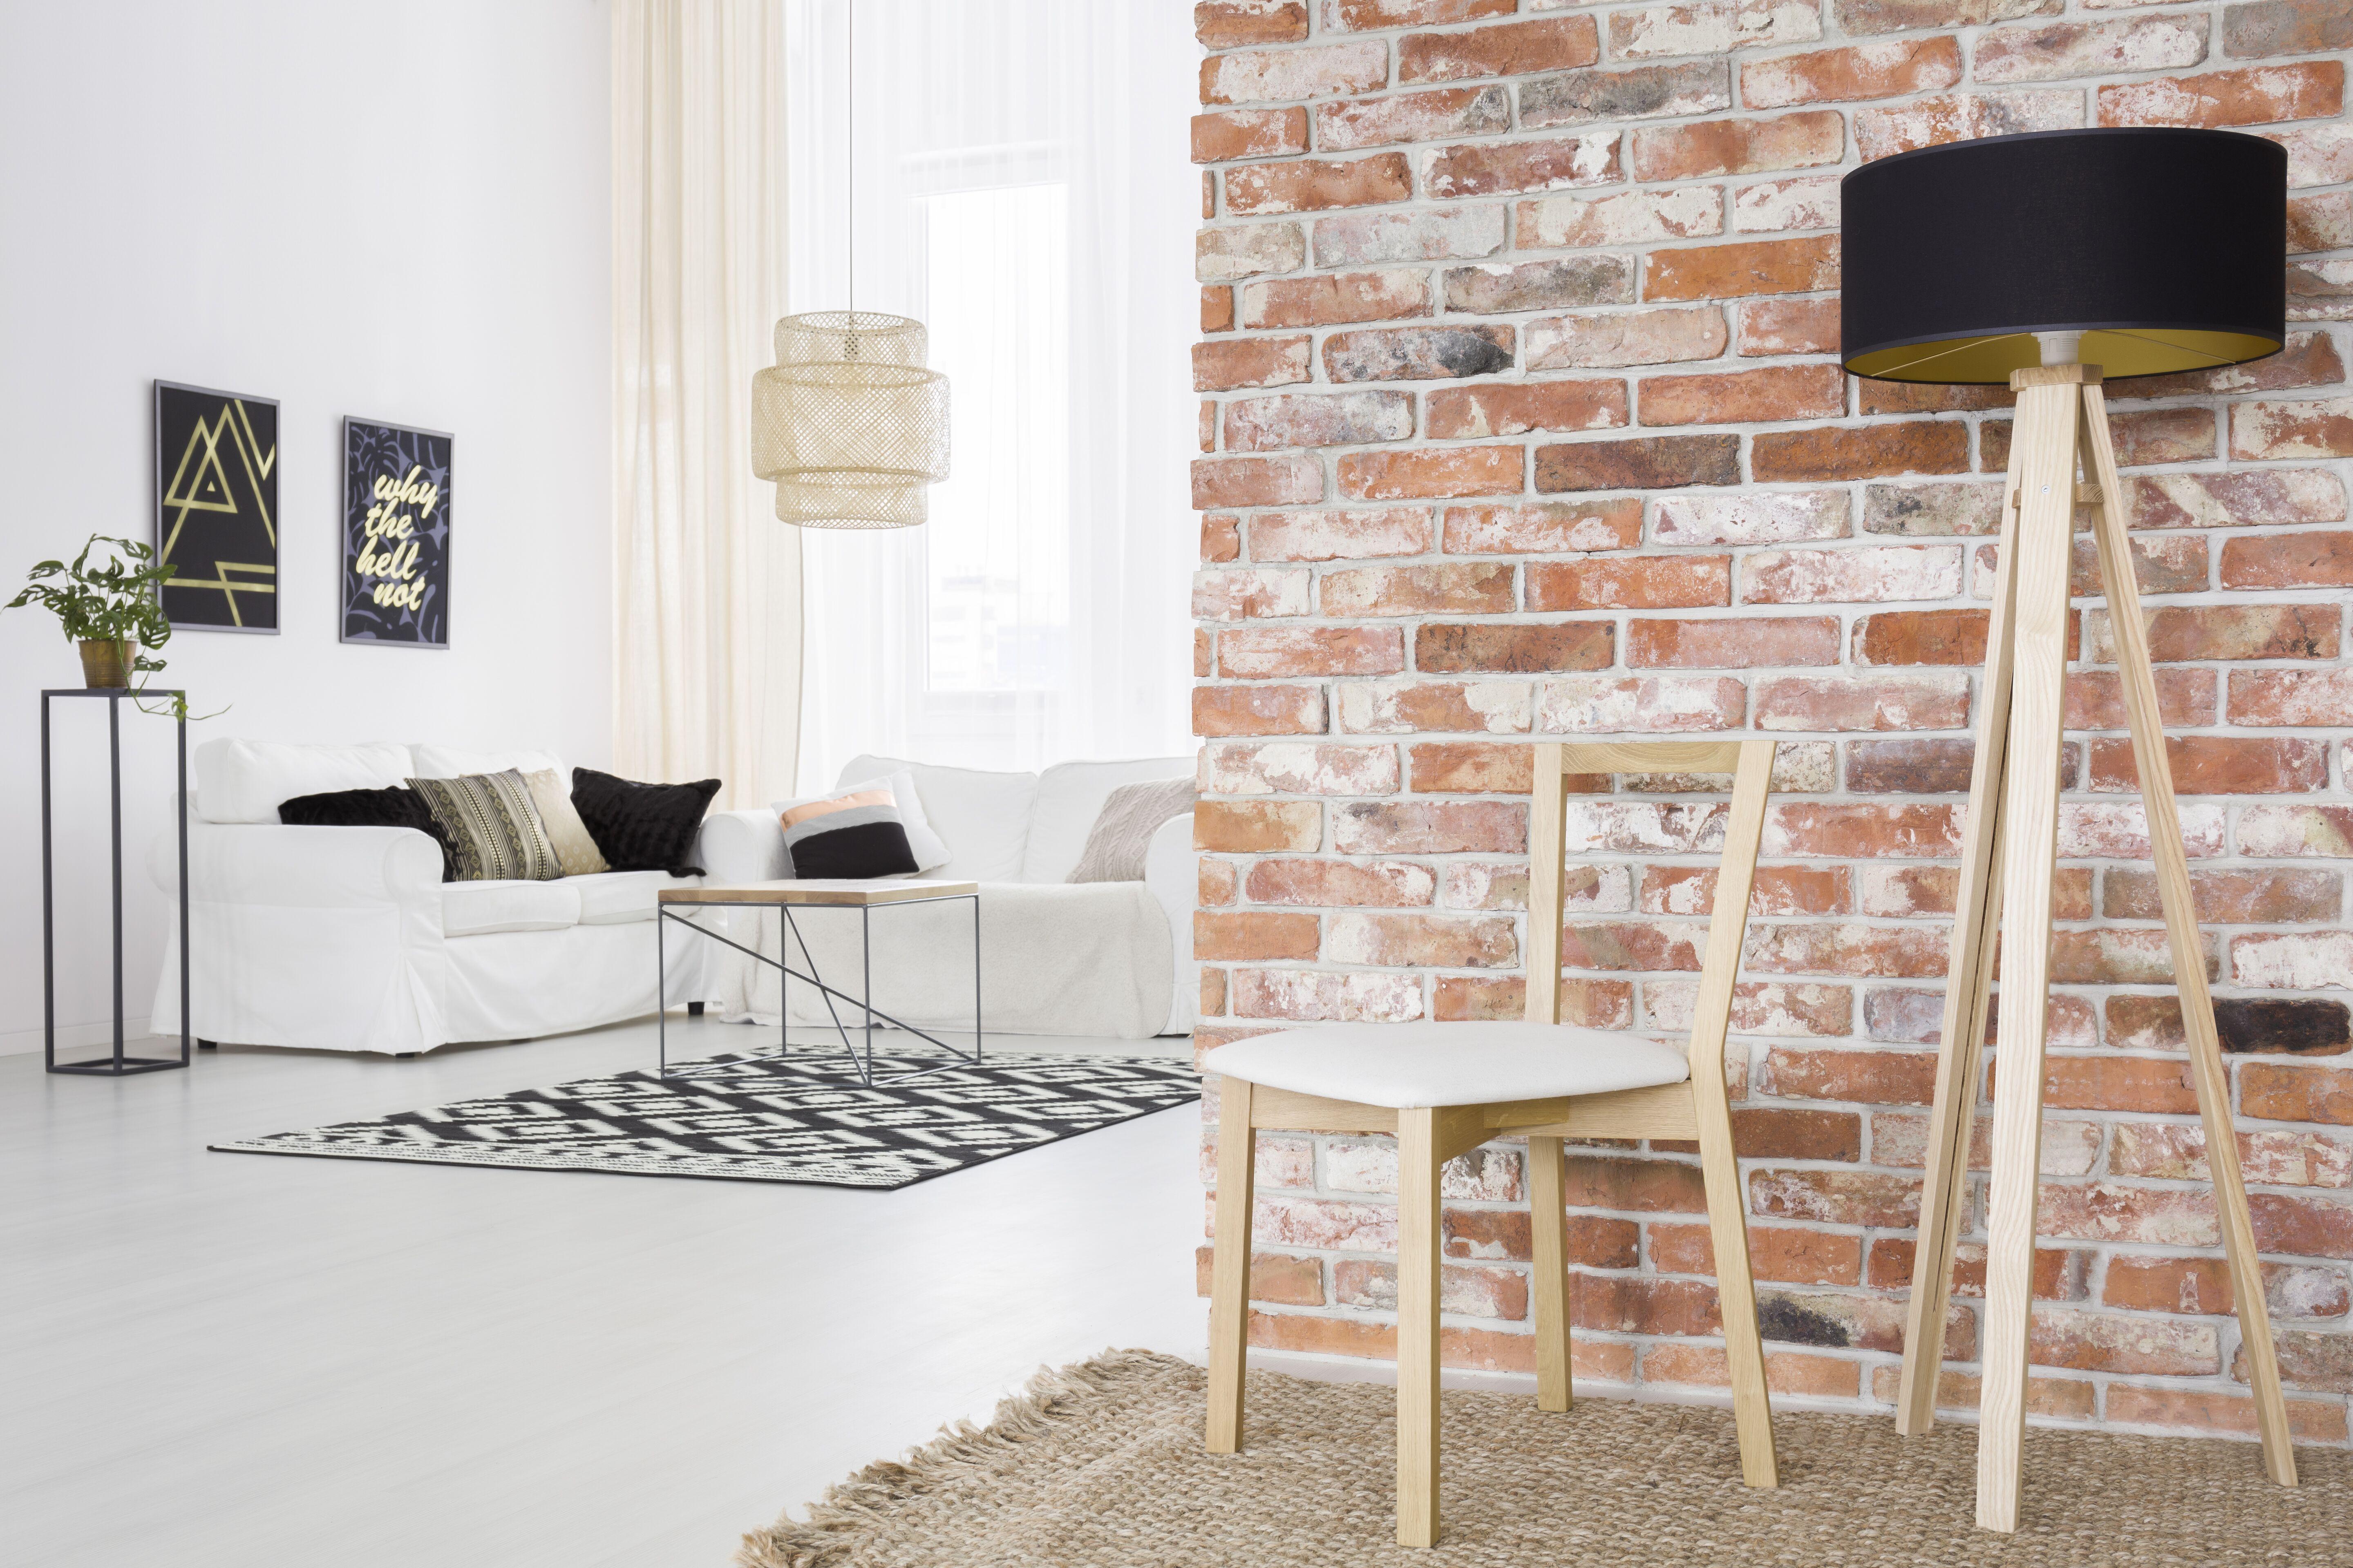 lampa ragaba wanda drewniana designerska ideal design